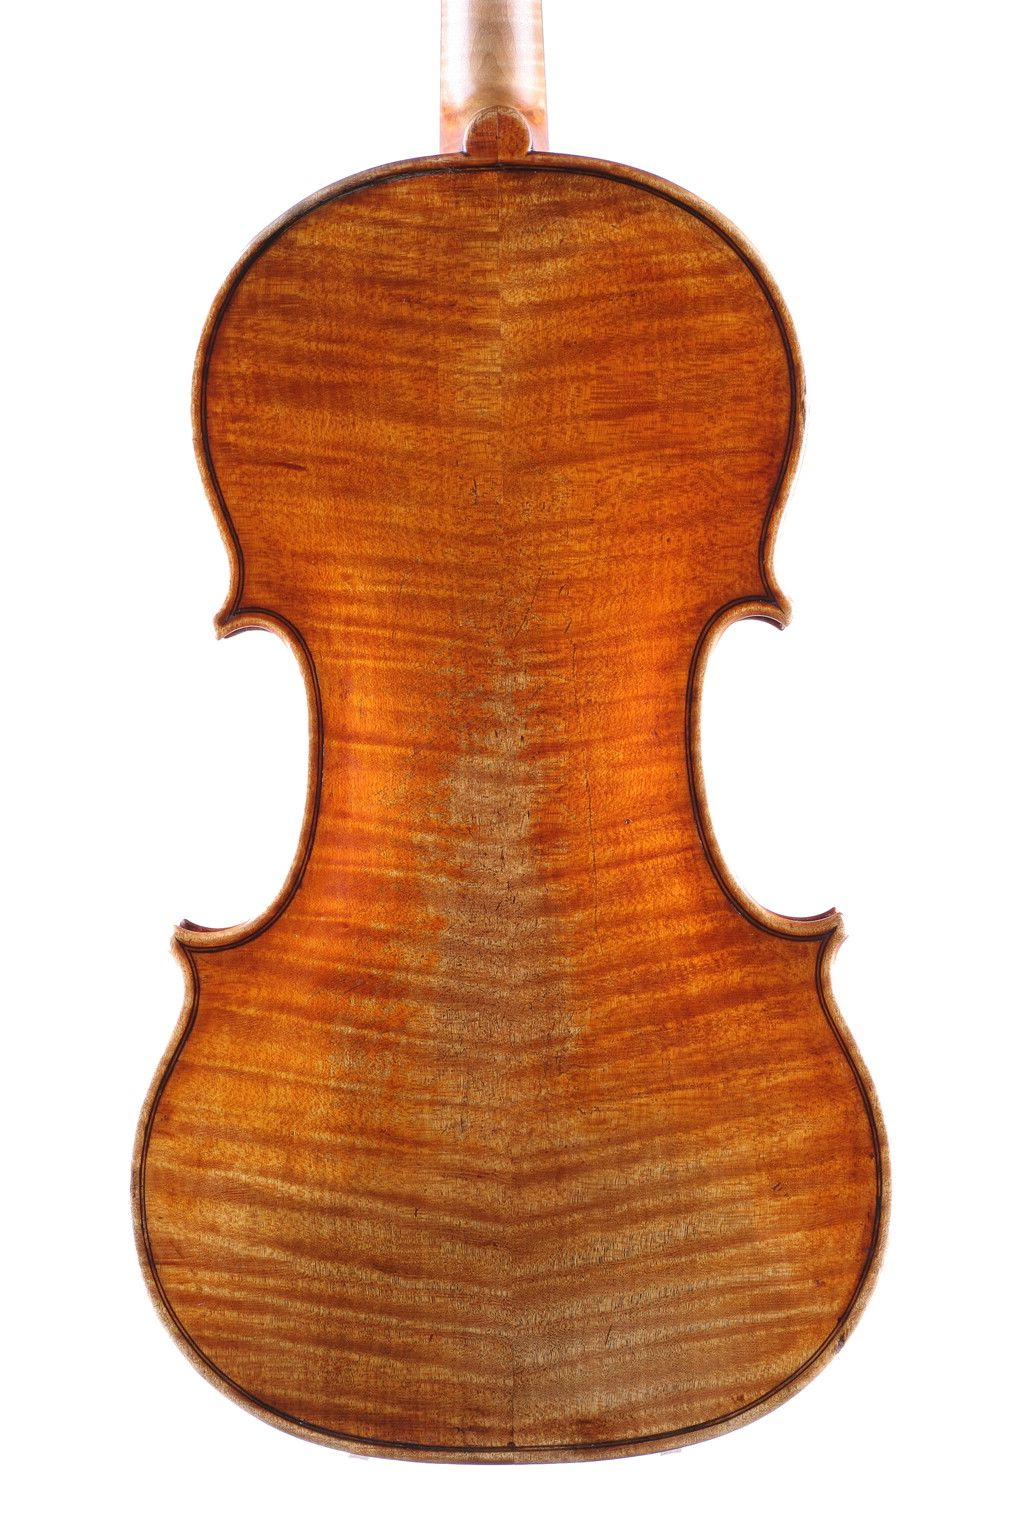 Pin On Violins Antonio Stradivari